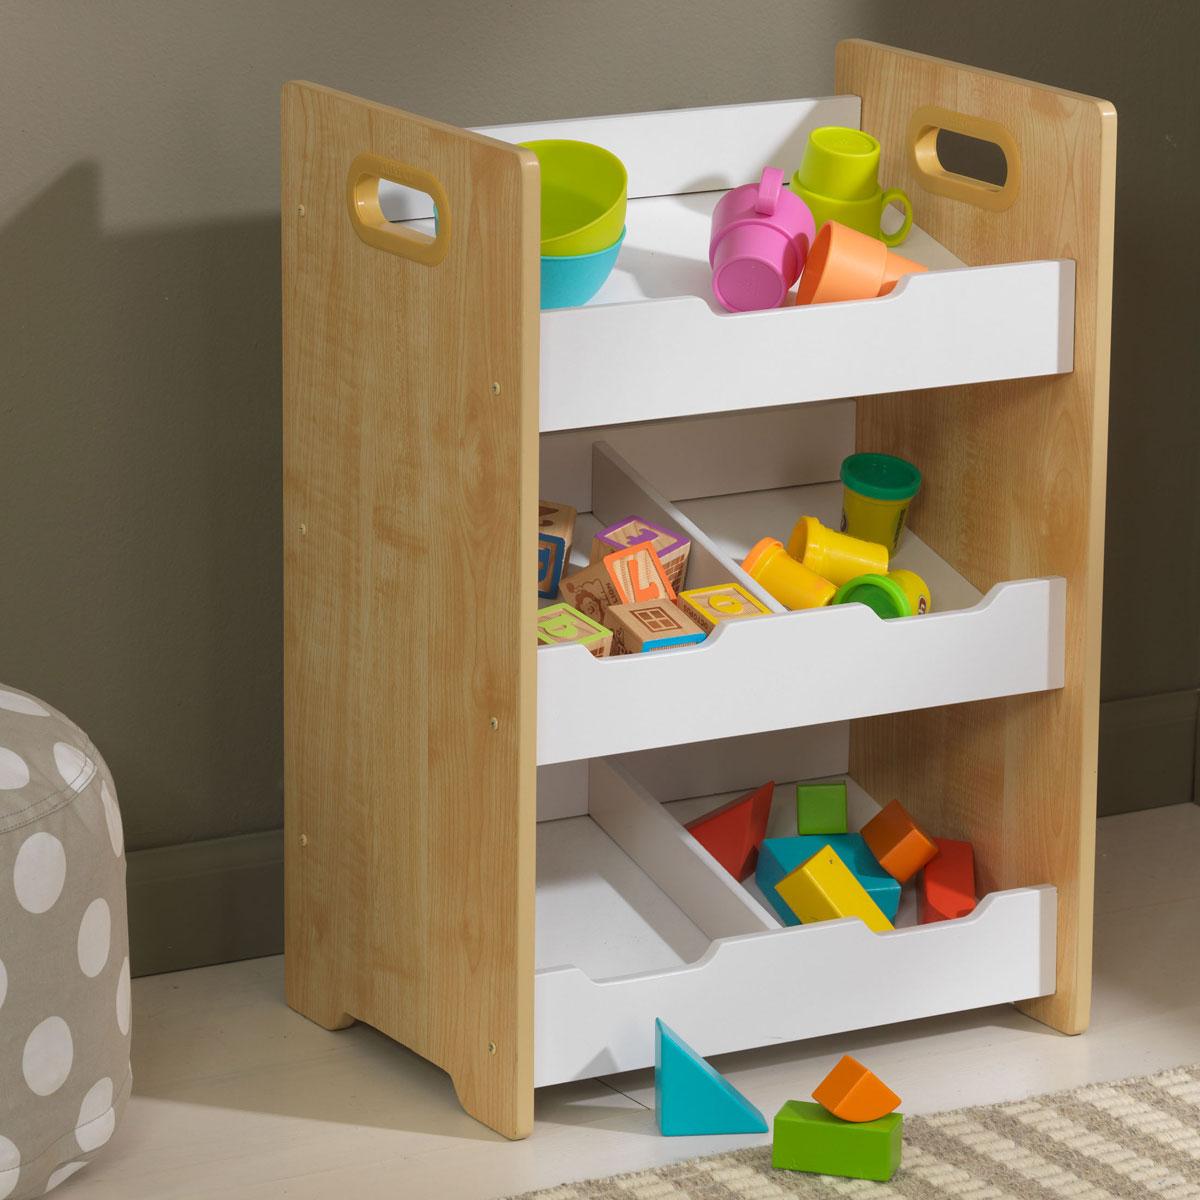 Kidkraft unit ad angolo con contenitori naturale 15766 - Muebles de almacenaje para ninos ...